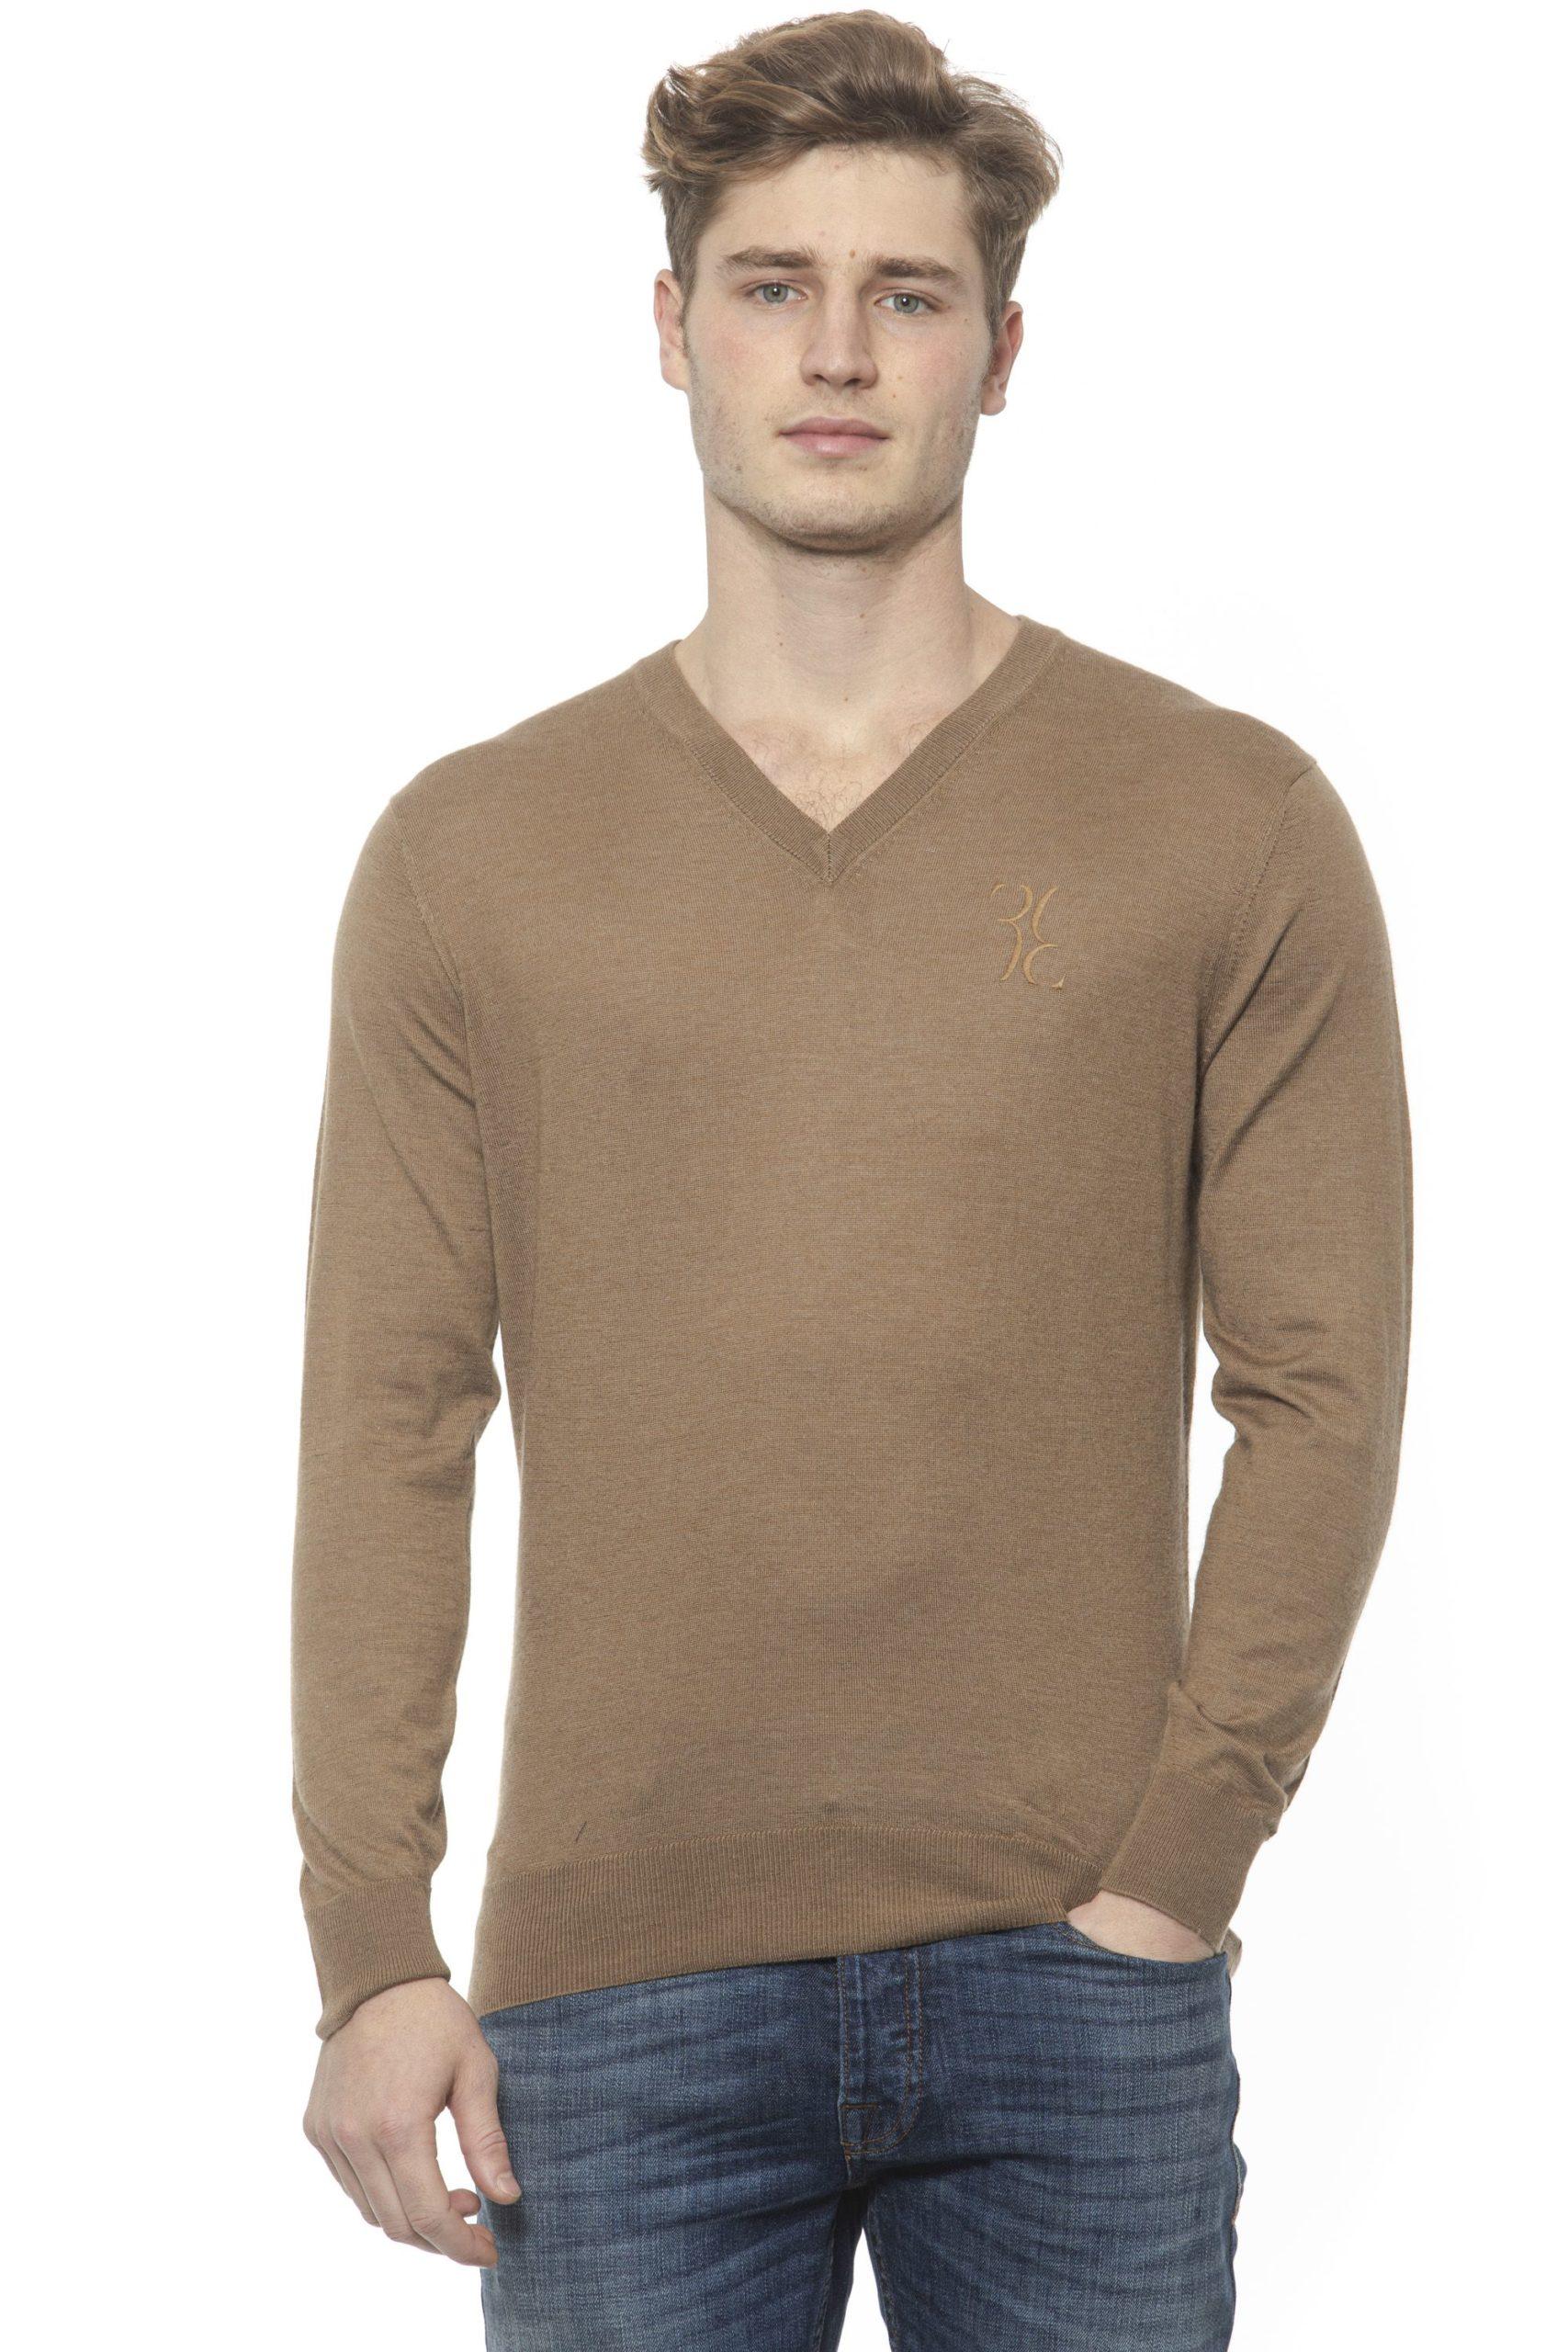 Billionaire Italian Couture Men's Tabacco Sweater Beige BI1313488 - M